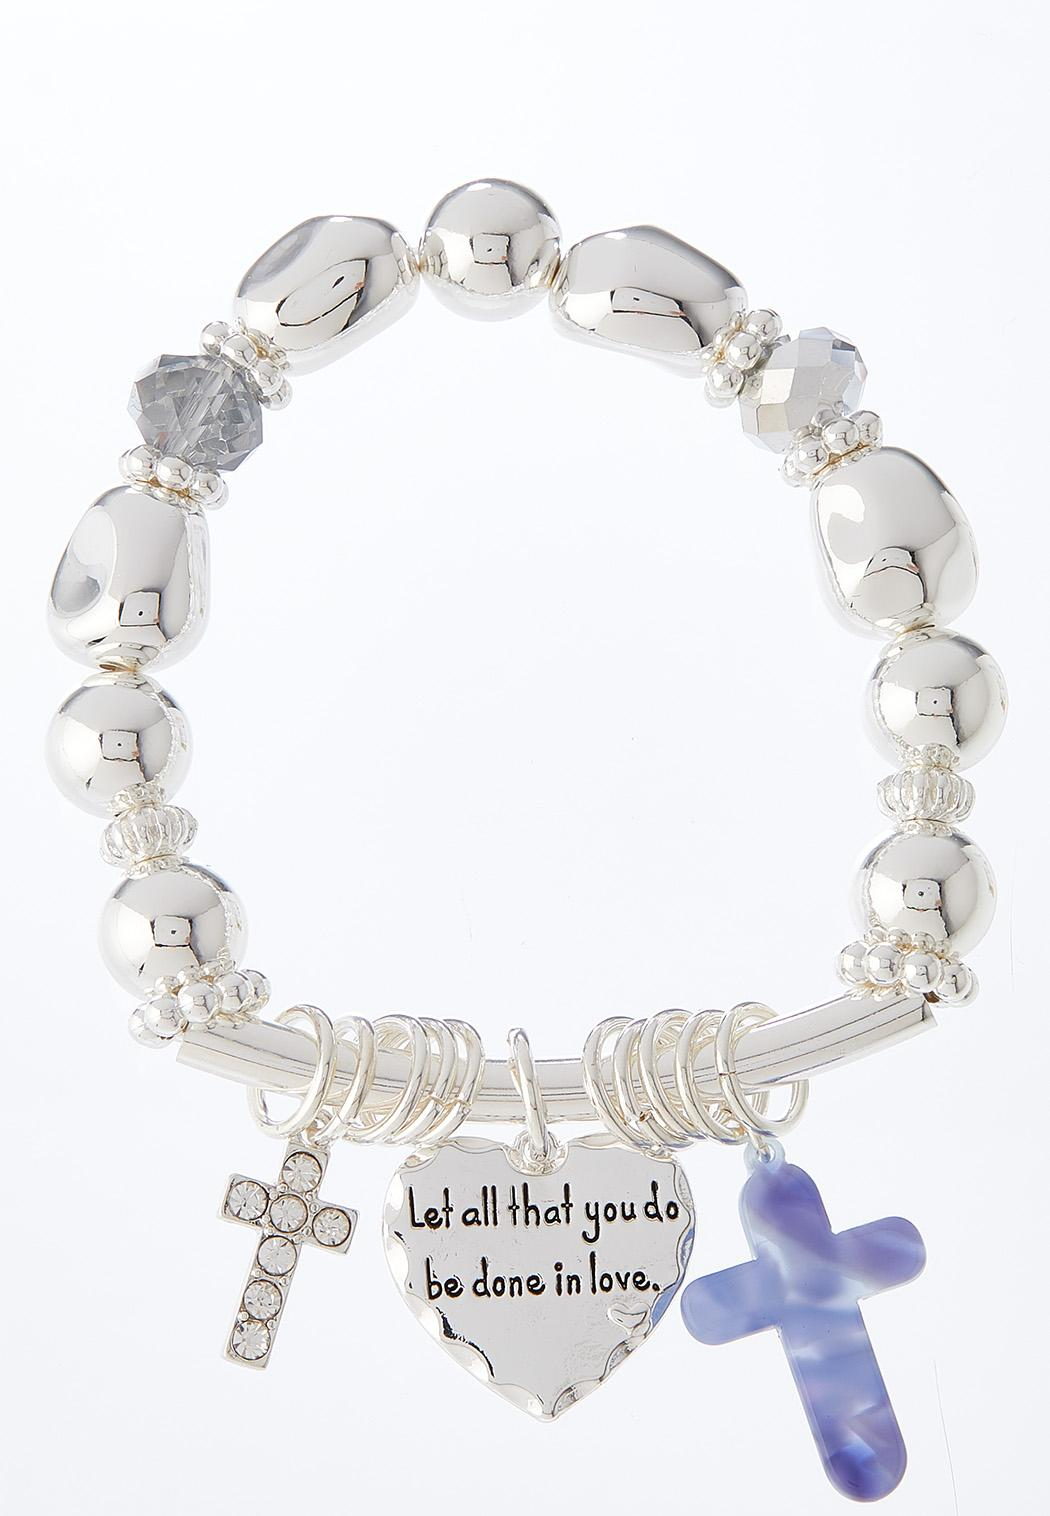 Inspirational Charm Stretch Bracelet